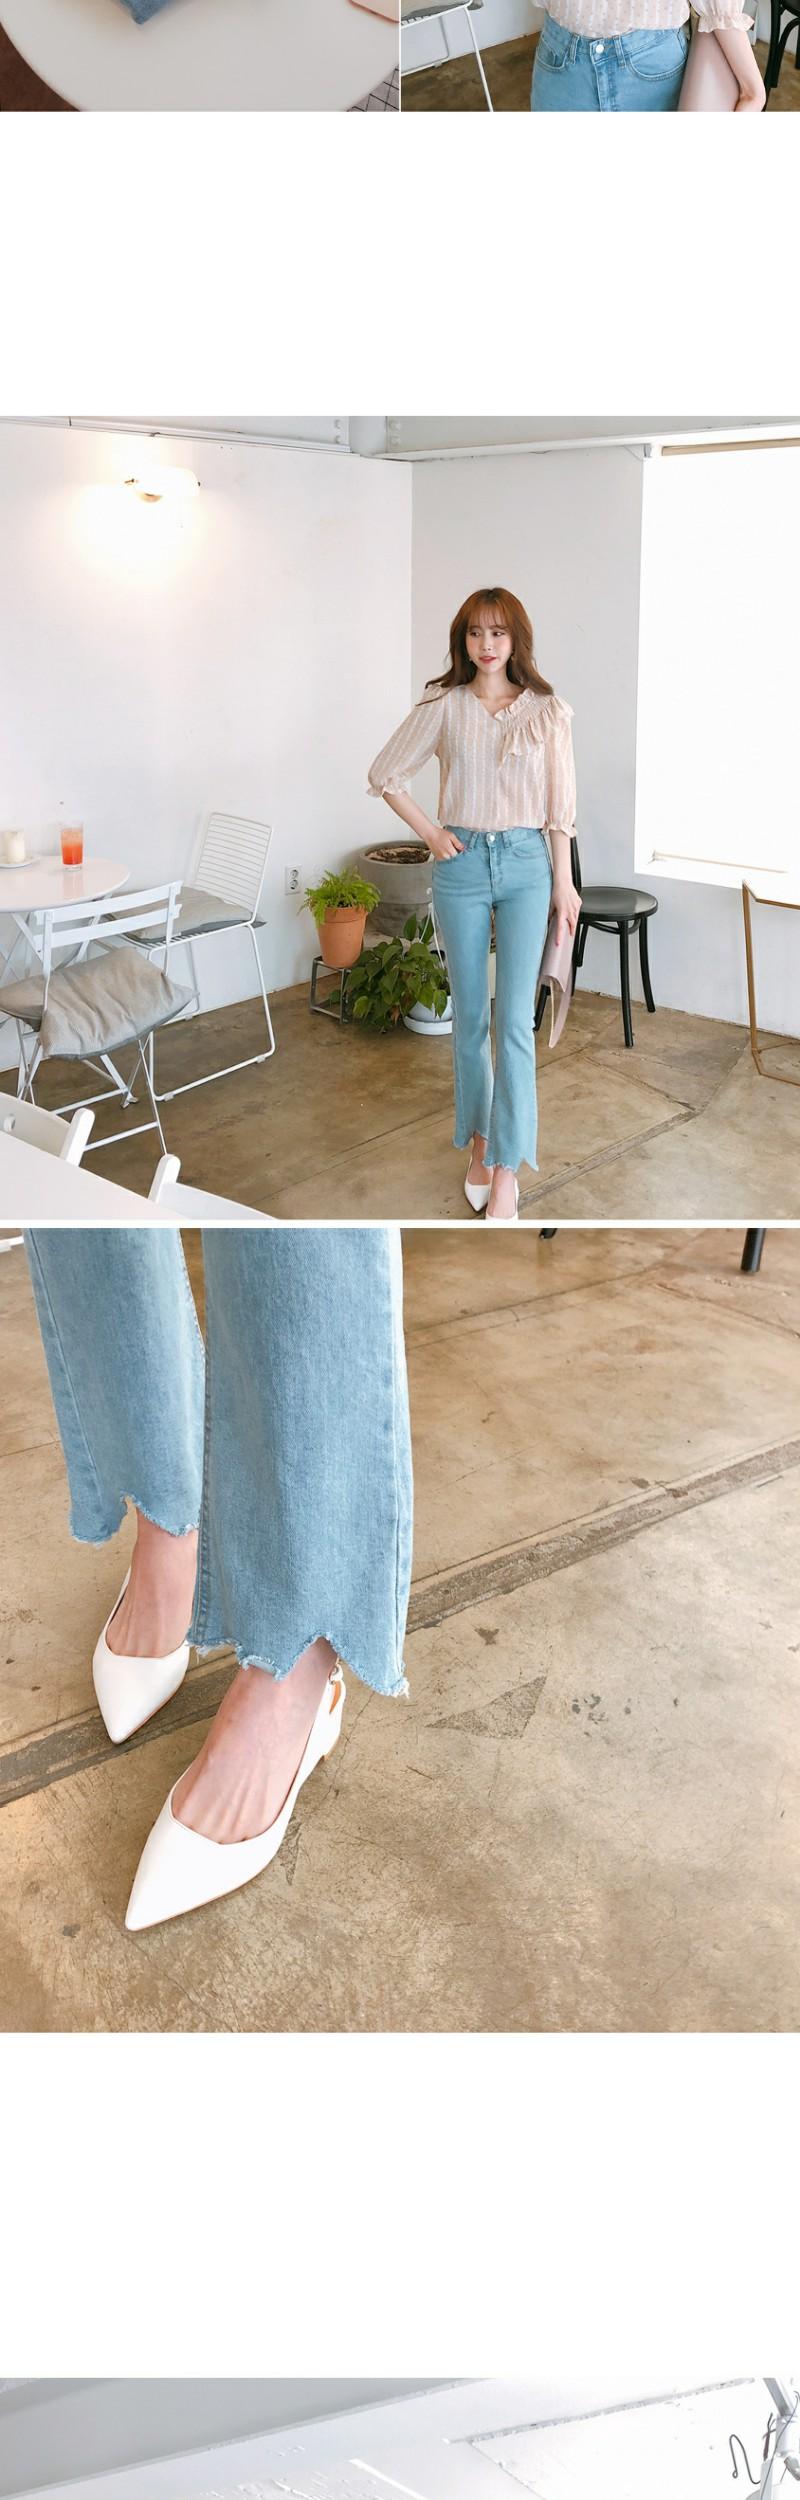 Wave cutting pants